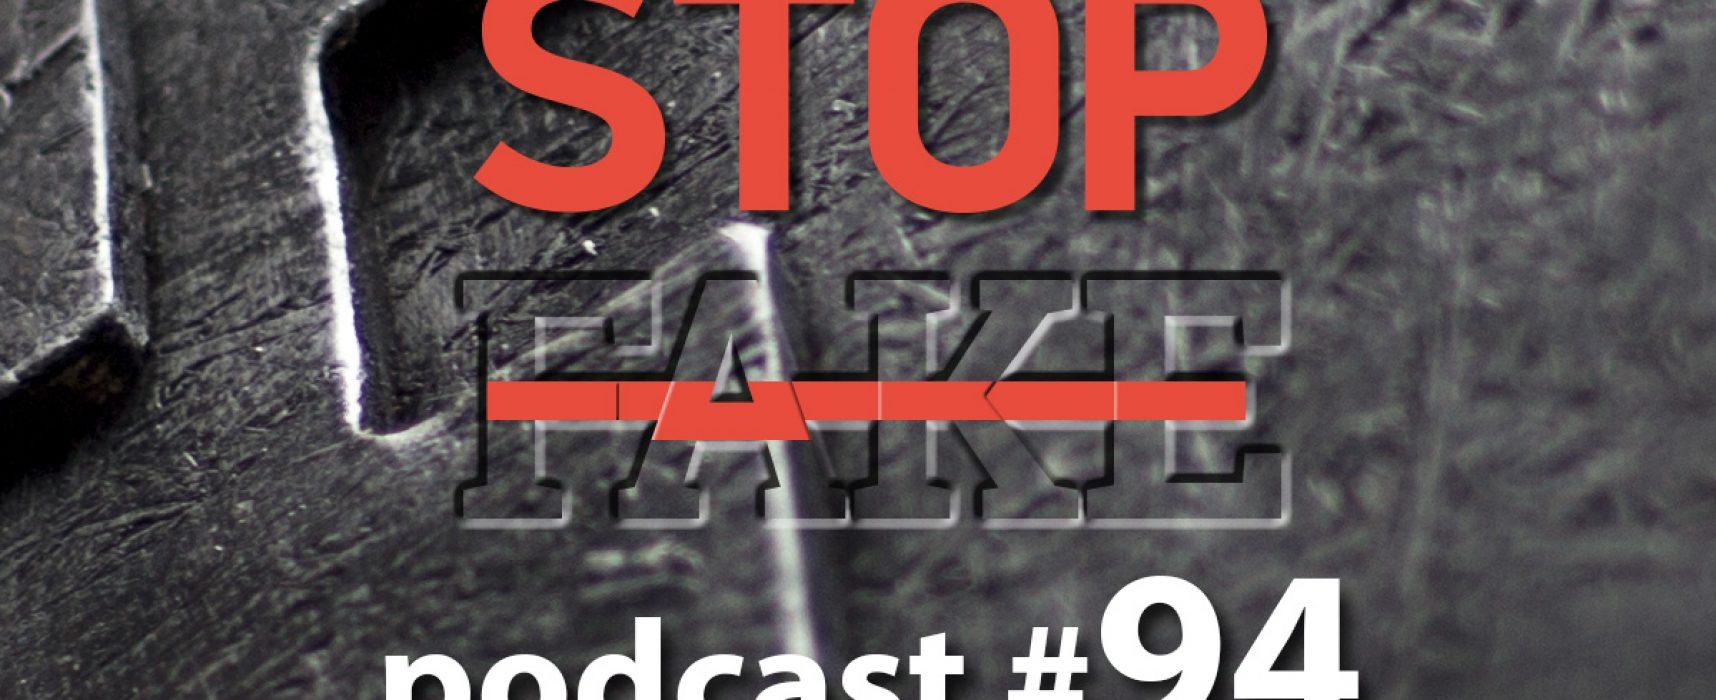 StopFake podcast #94